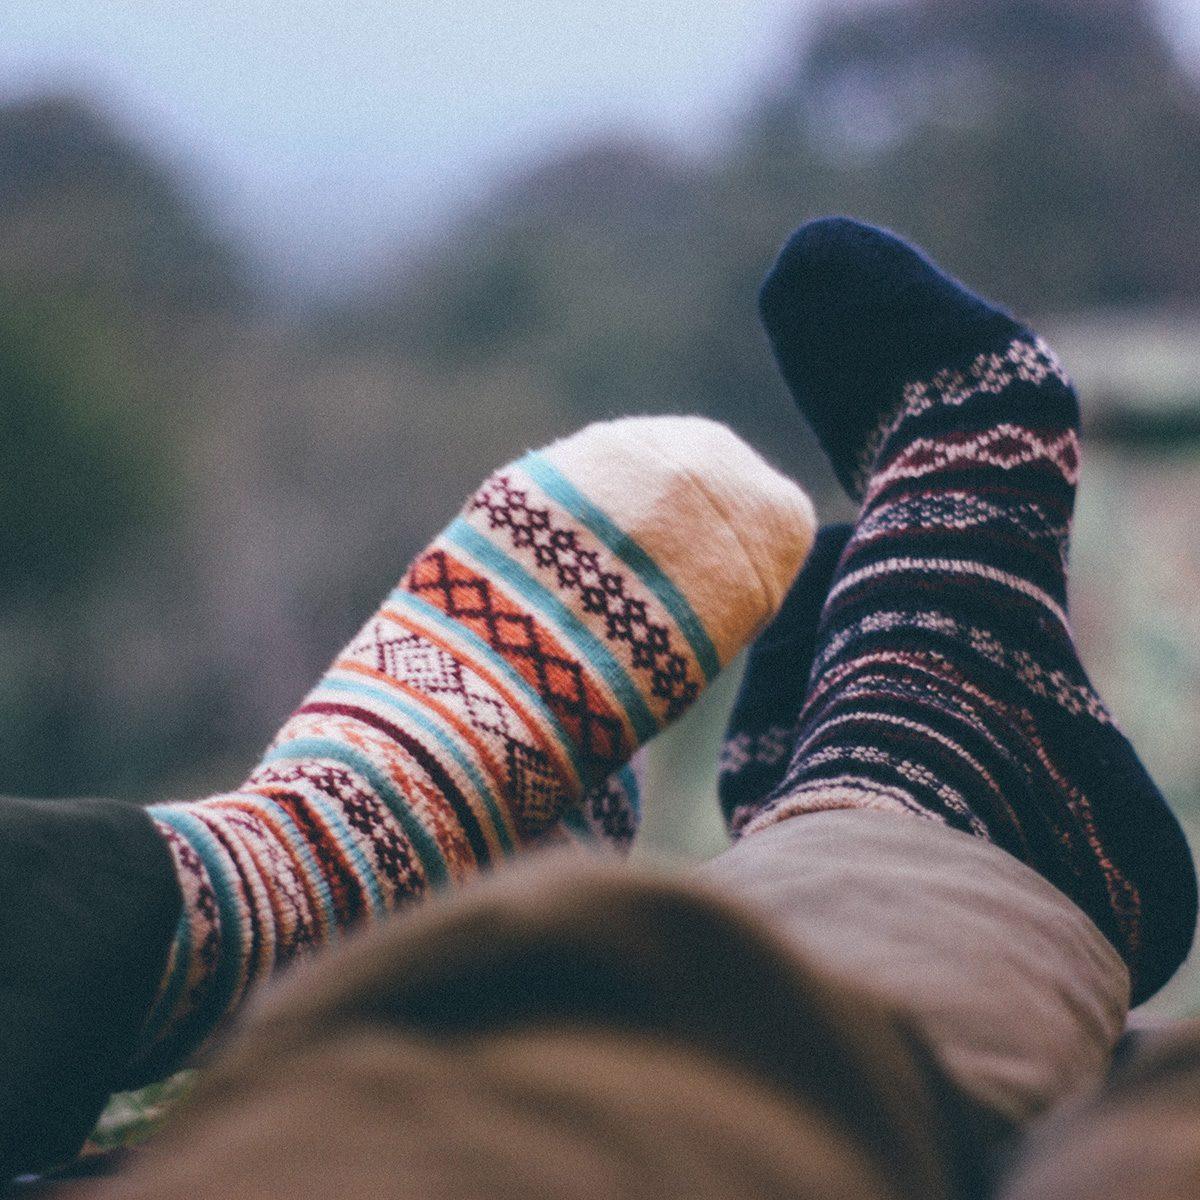 Low Section Of People Wearing Socks Against Defocused Background